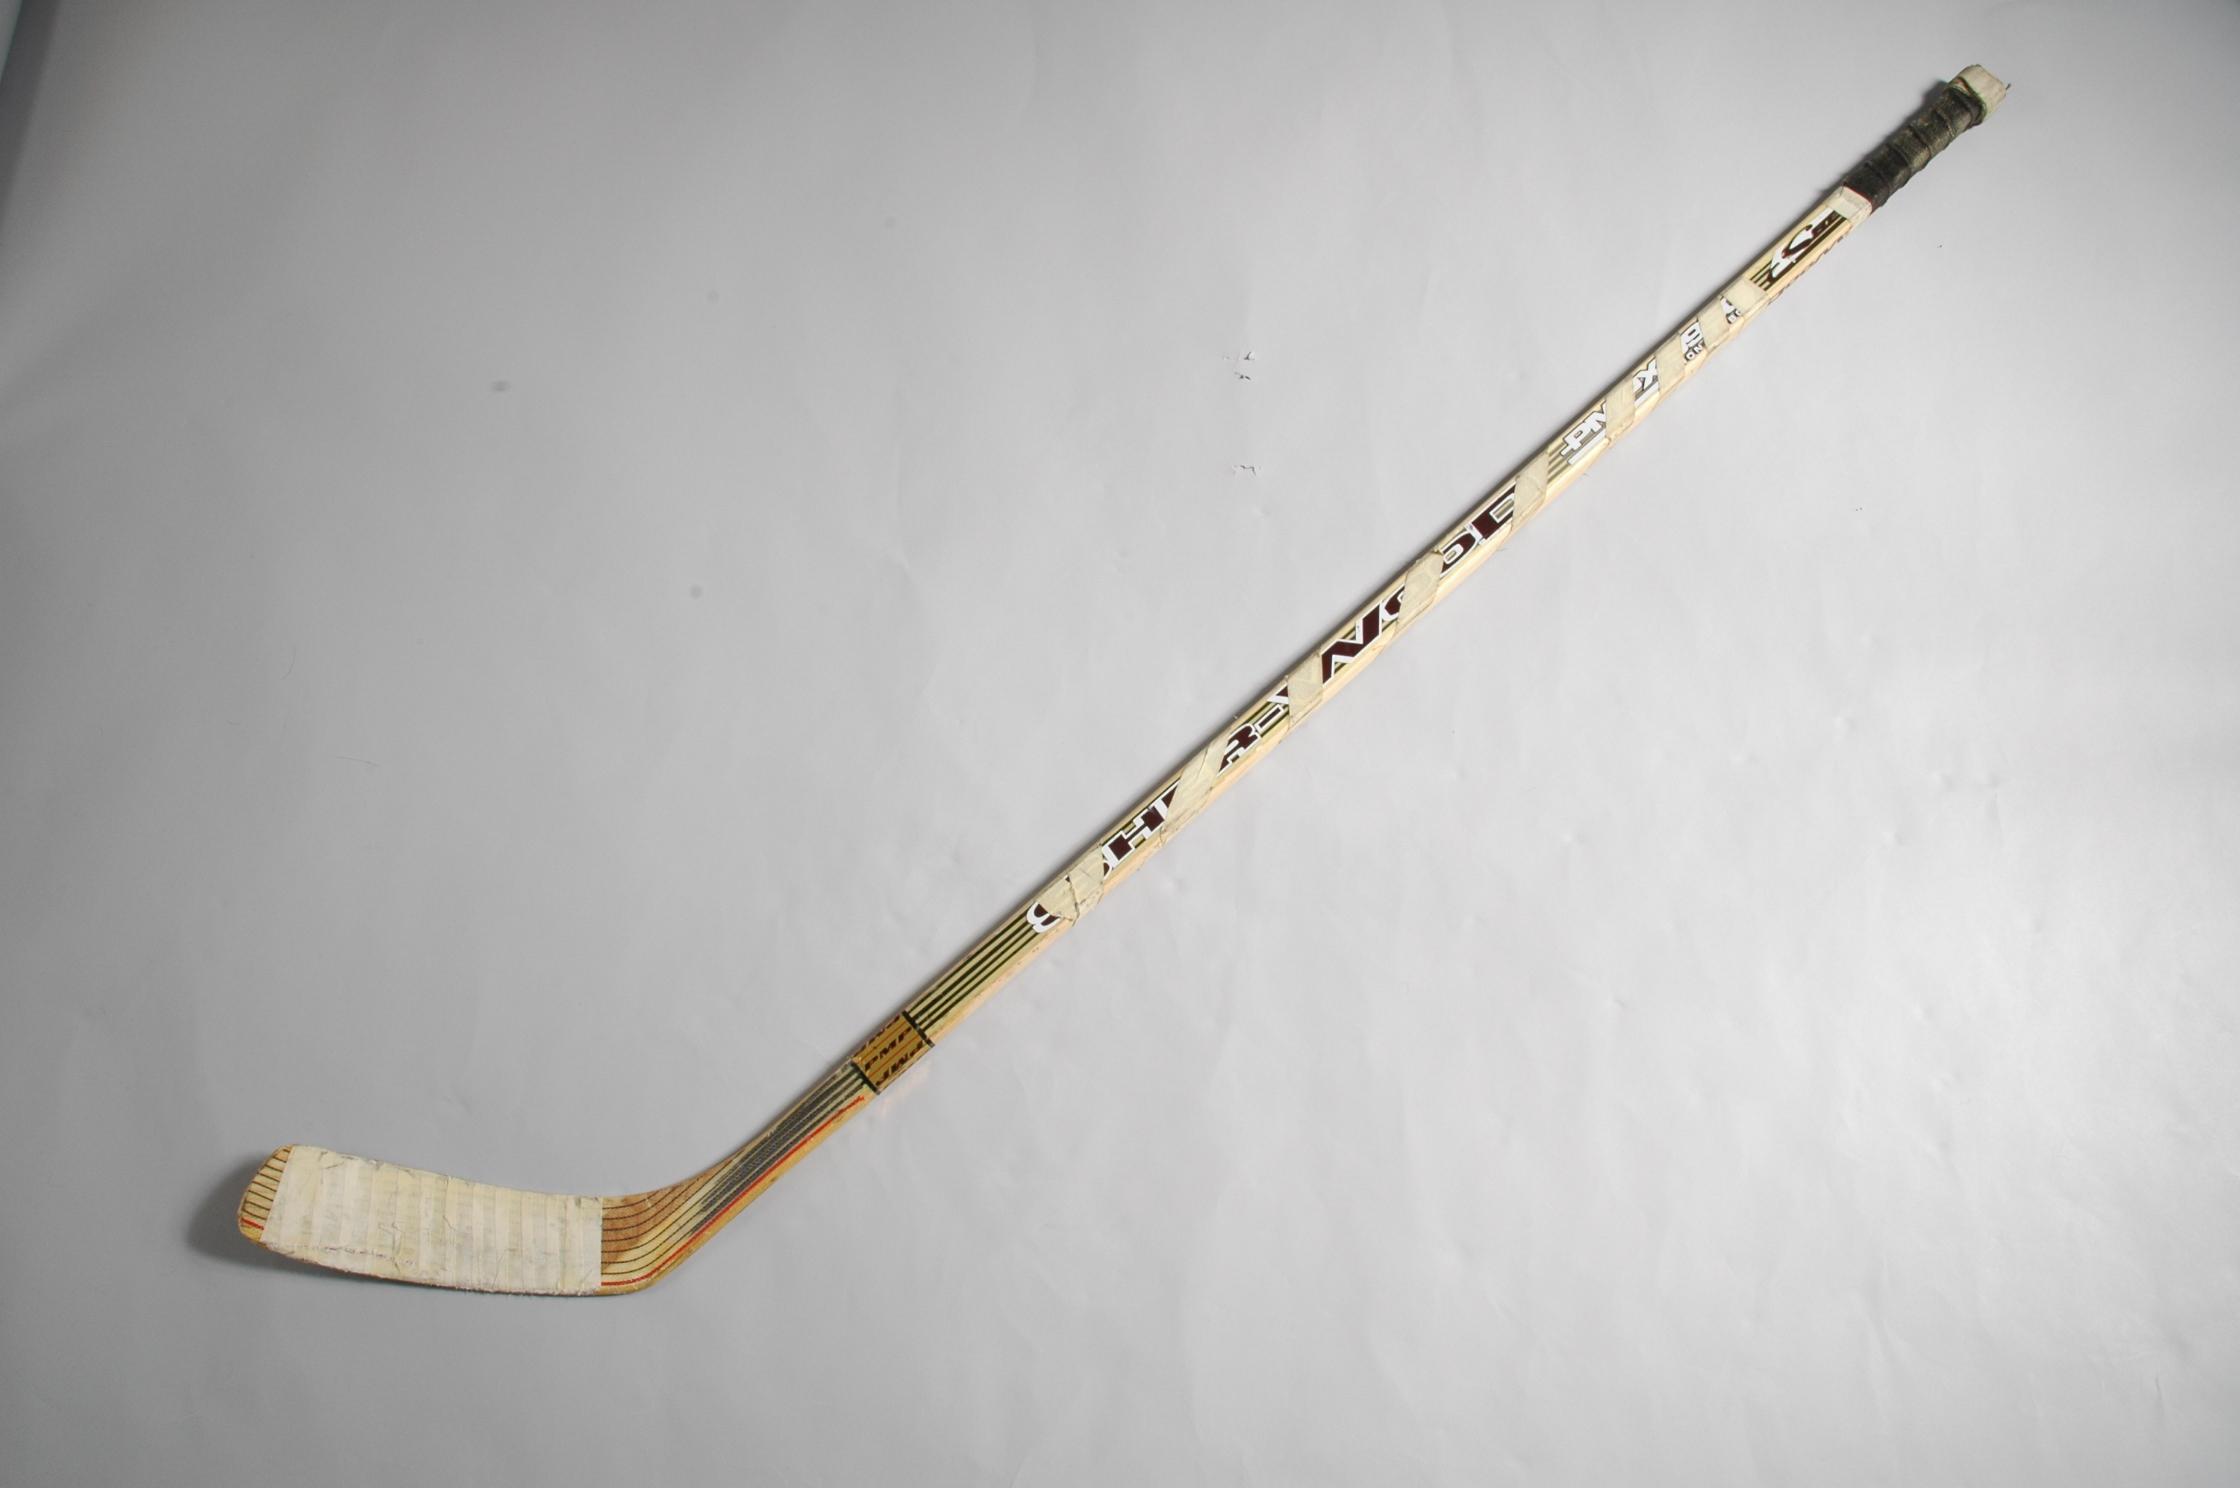 Old Wood Hockey Stick - Bing images